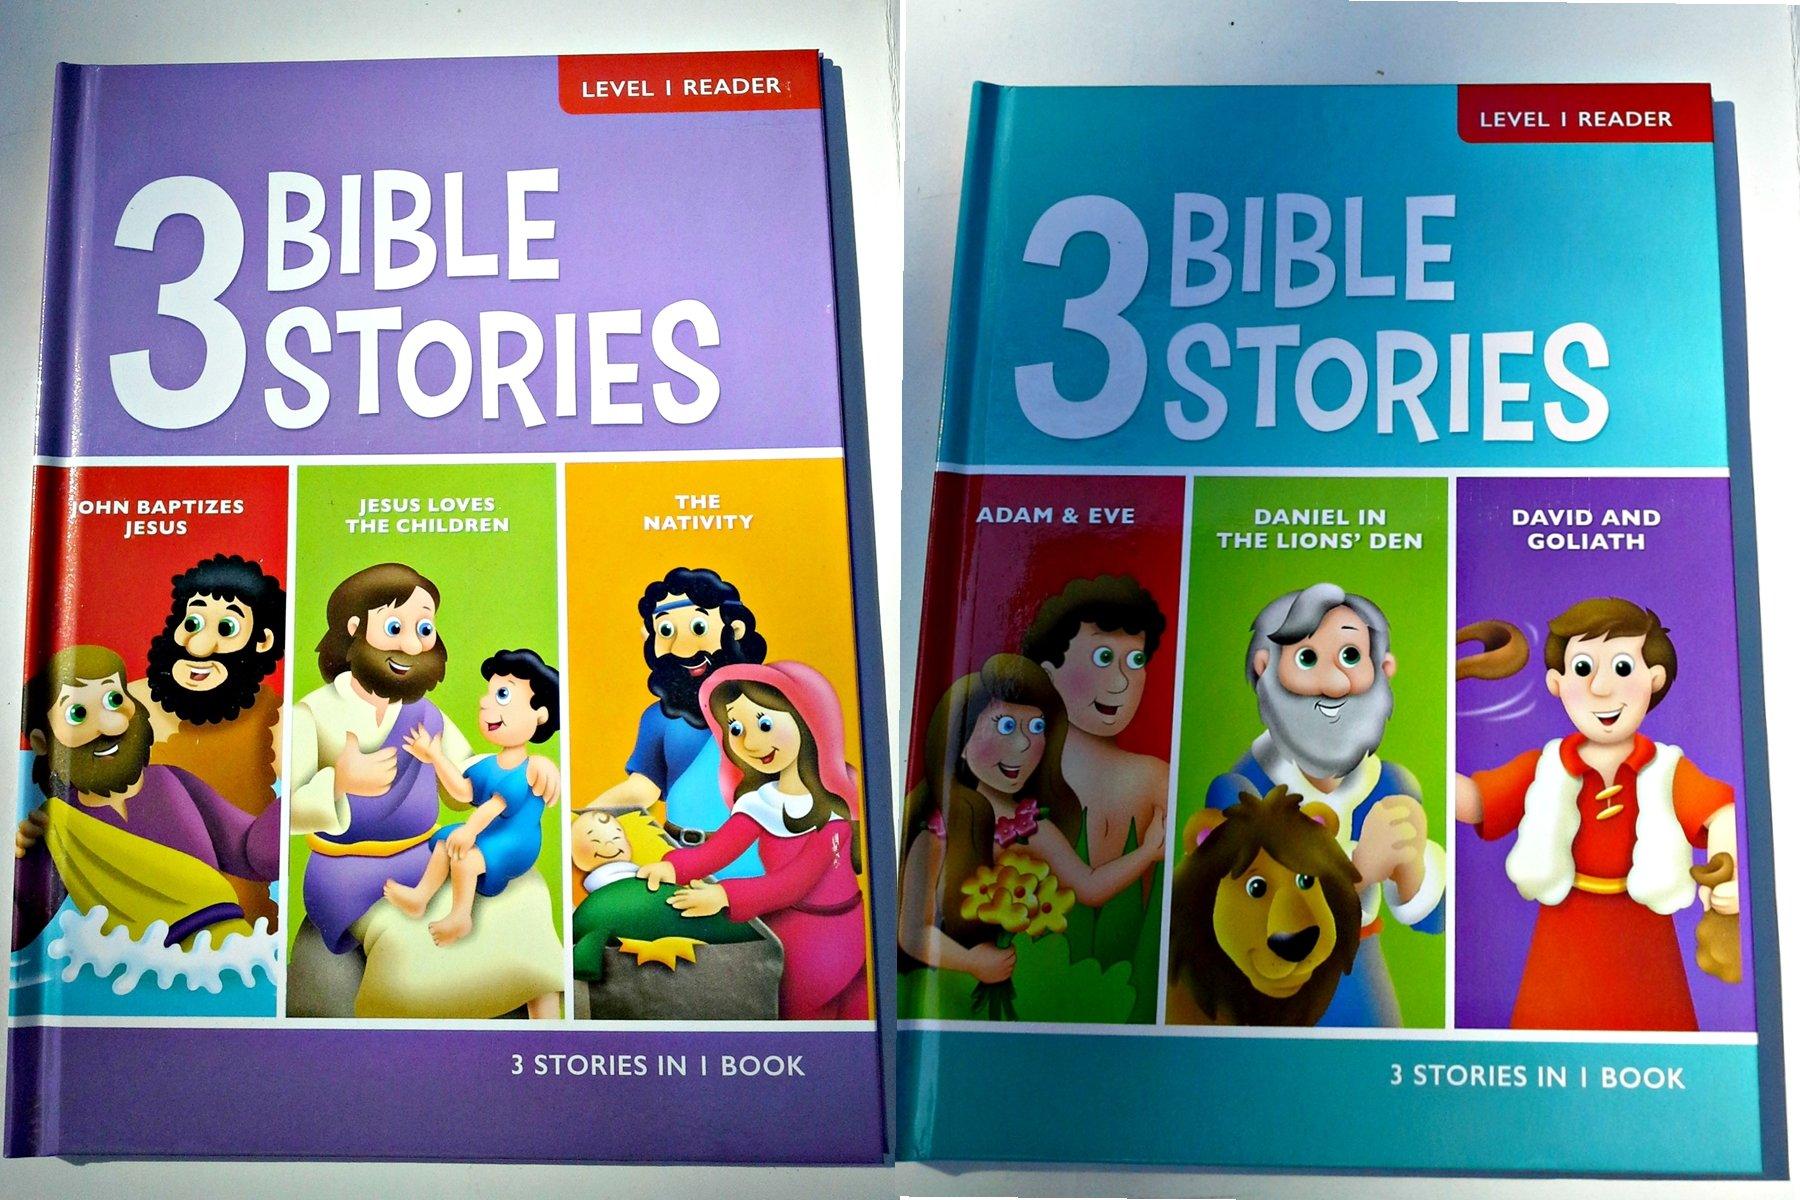 Download 3 Bible Stories Level 1 Reader Books - Set of 2 - Ages 4-7 (John, Jesus, Nativity, Adam & Eve, Daniel, David) pdf epub